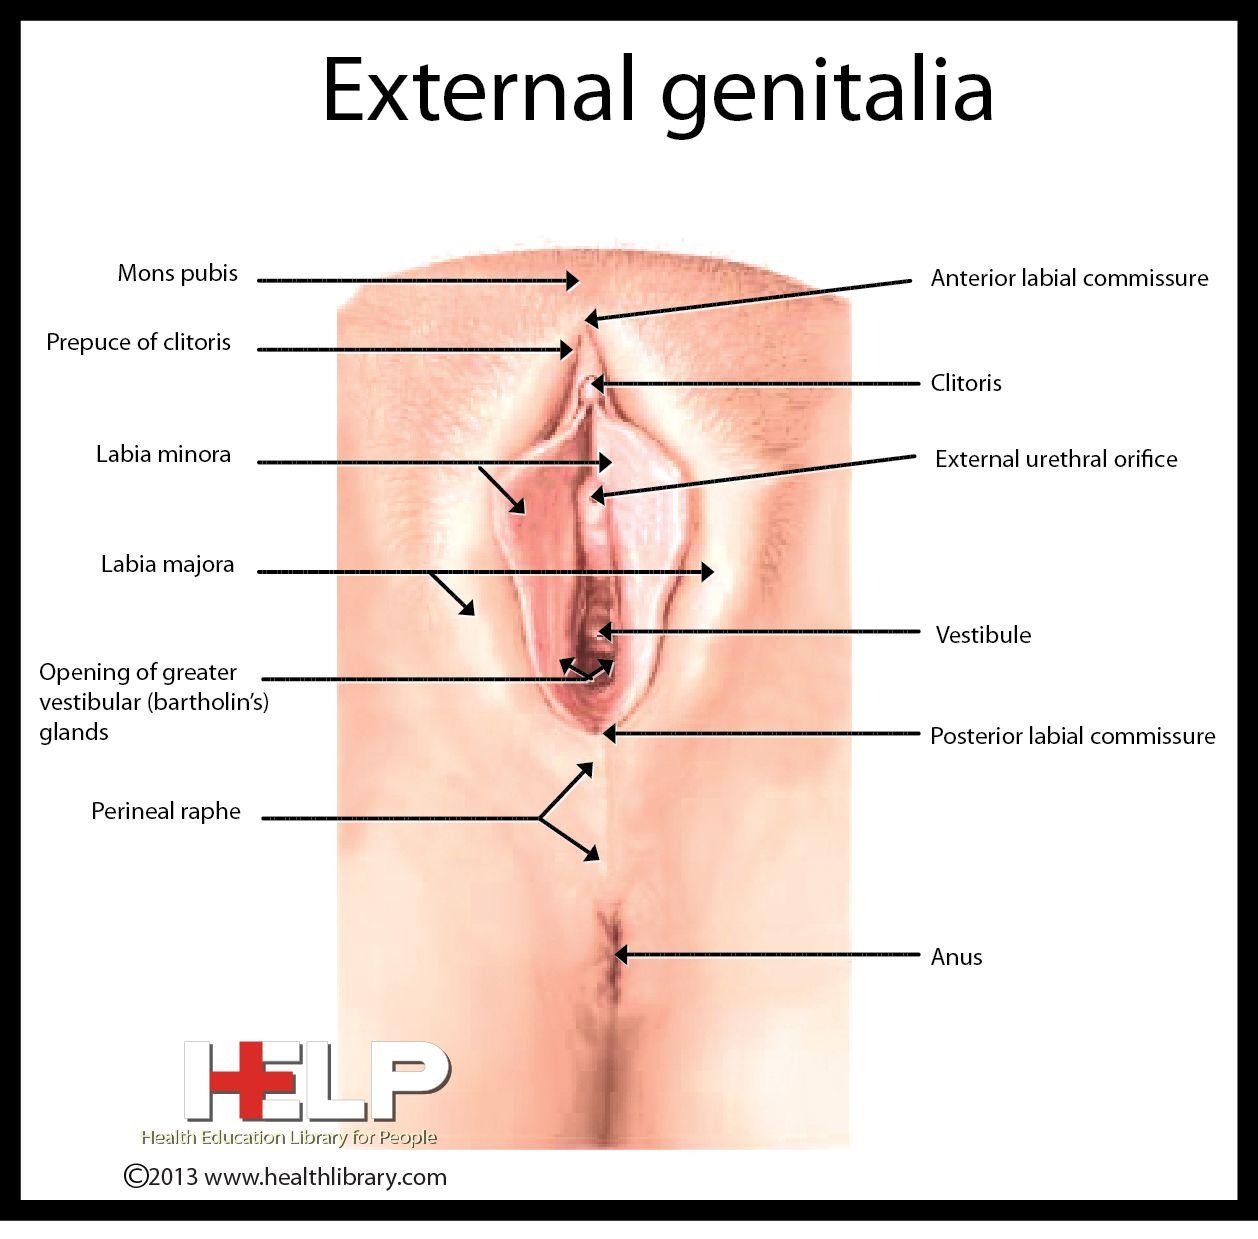 External Genitalia | Female Reproductive System ... | 1258 x 1239 jpeg 113kB